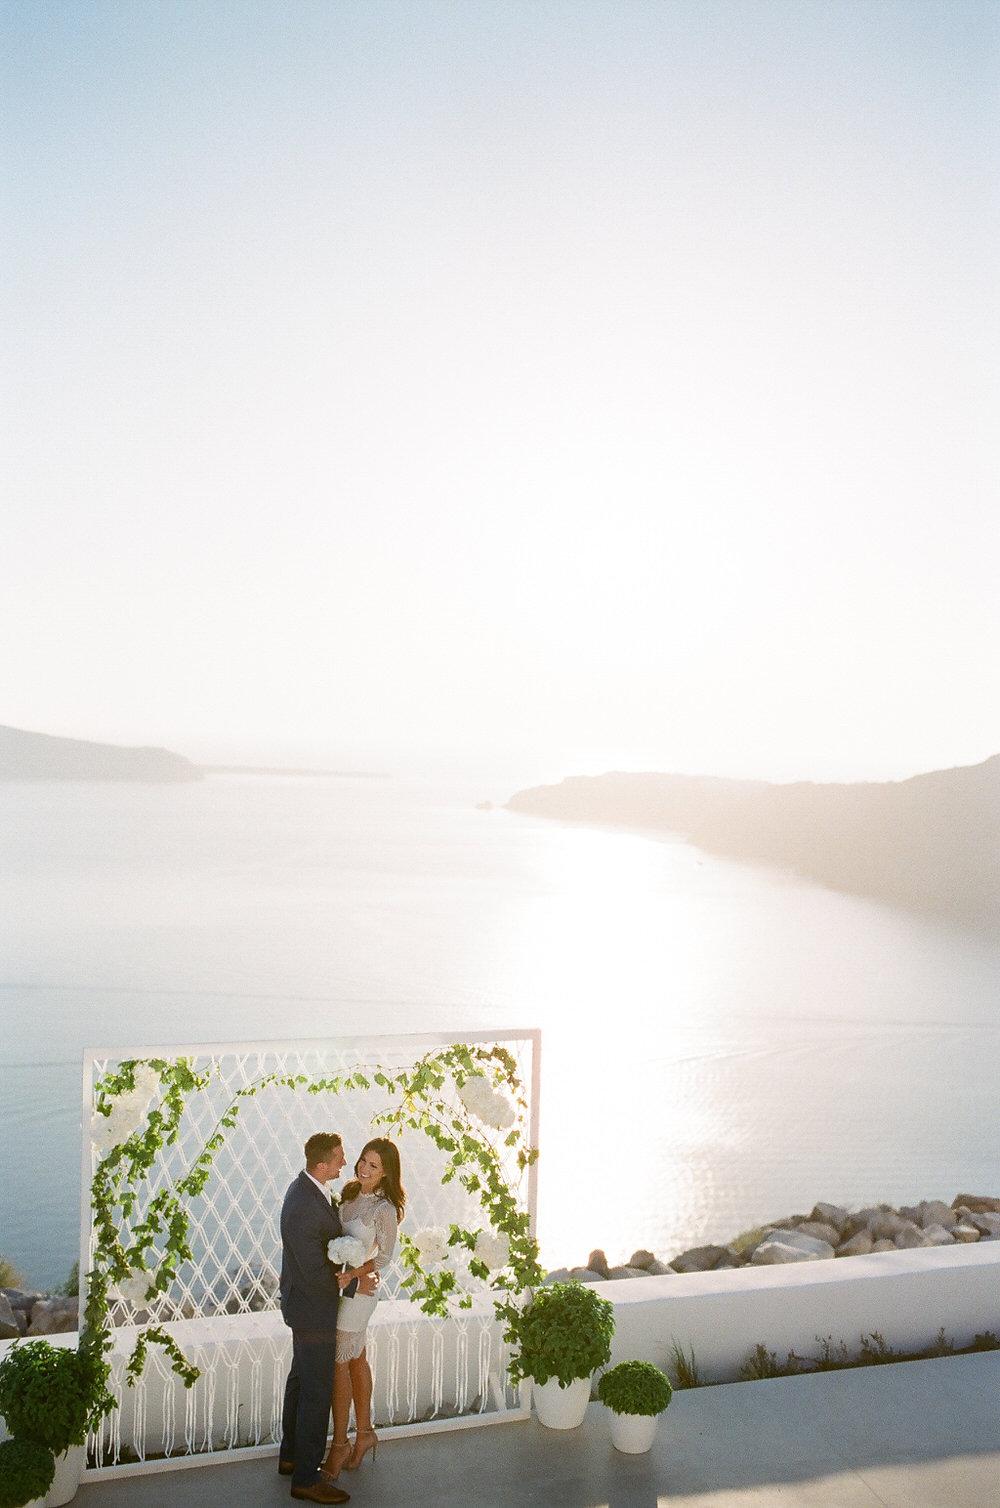 Santorini film wedding photographer Les Ananou | glam intimate santorini elopement